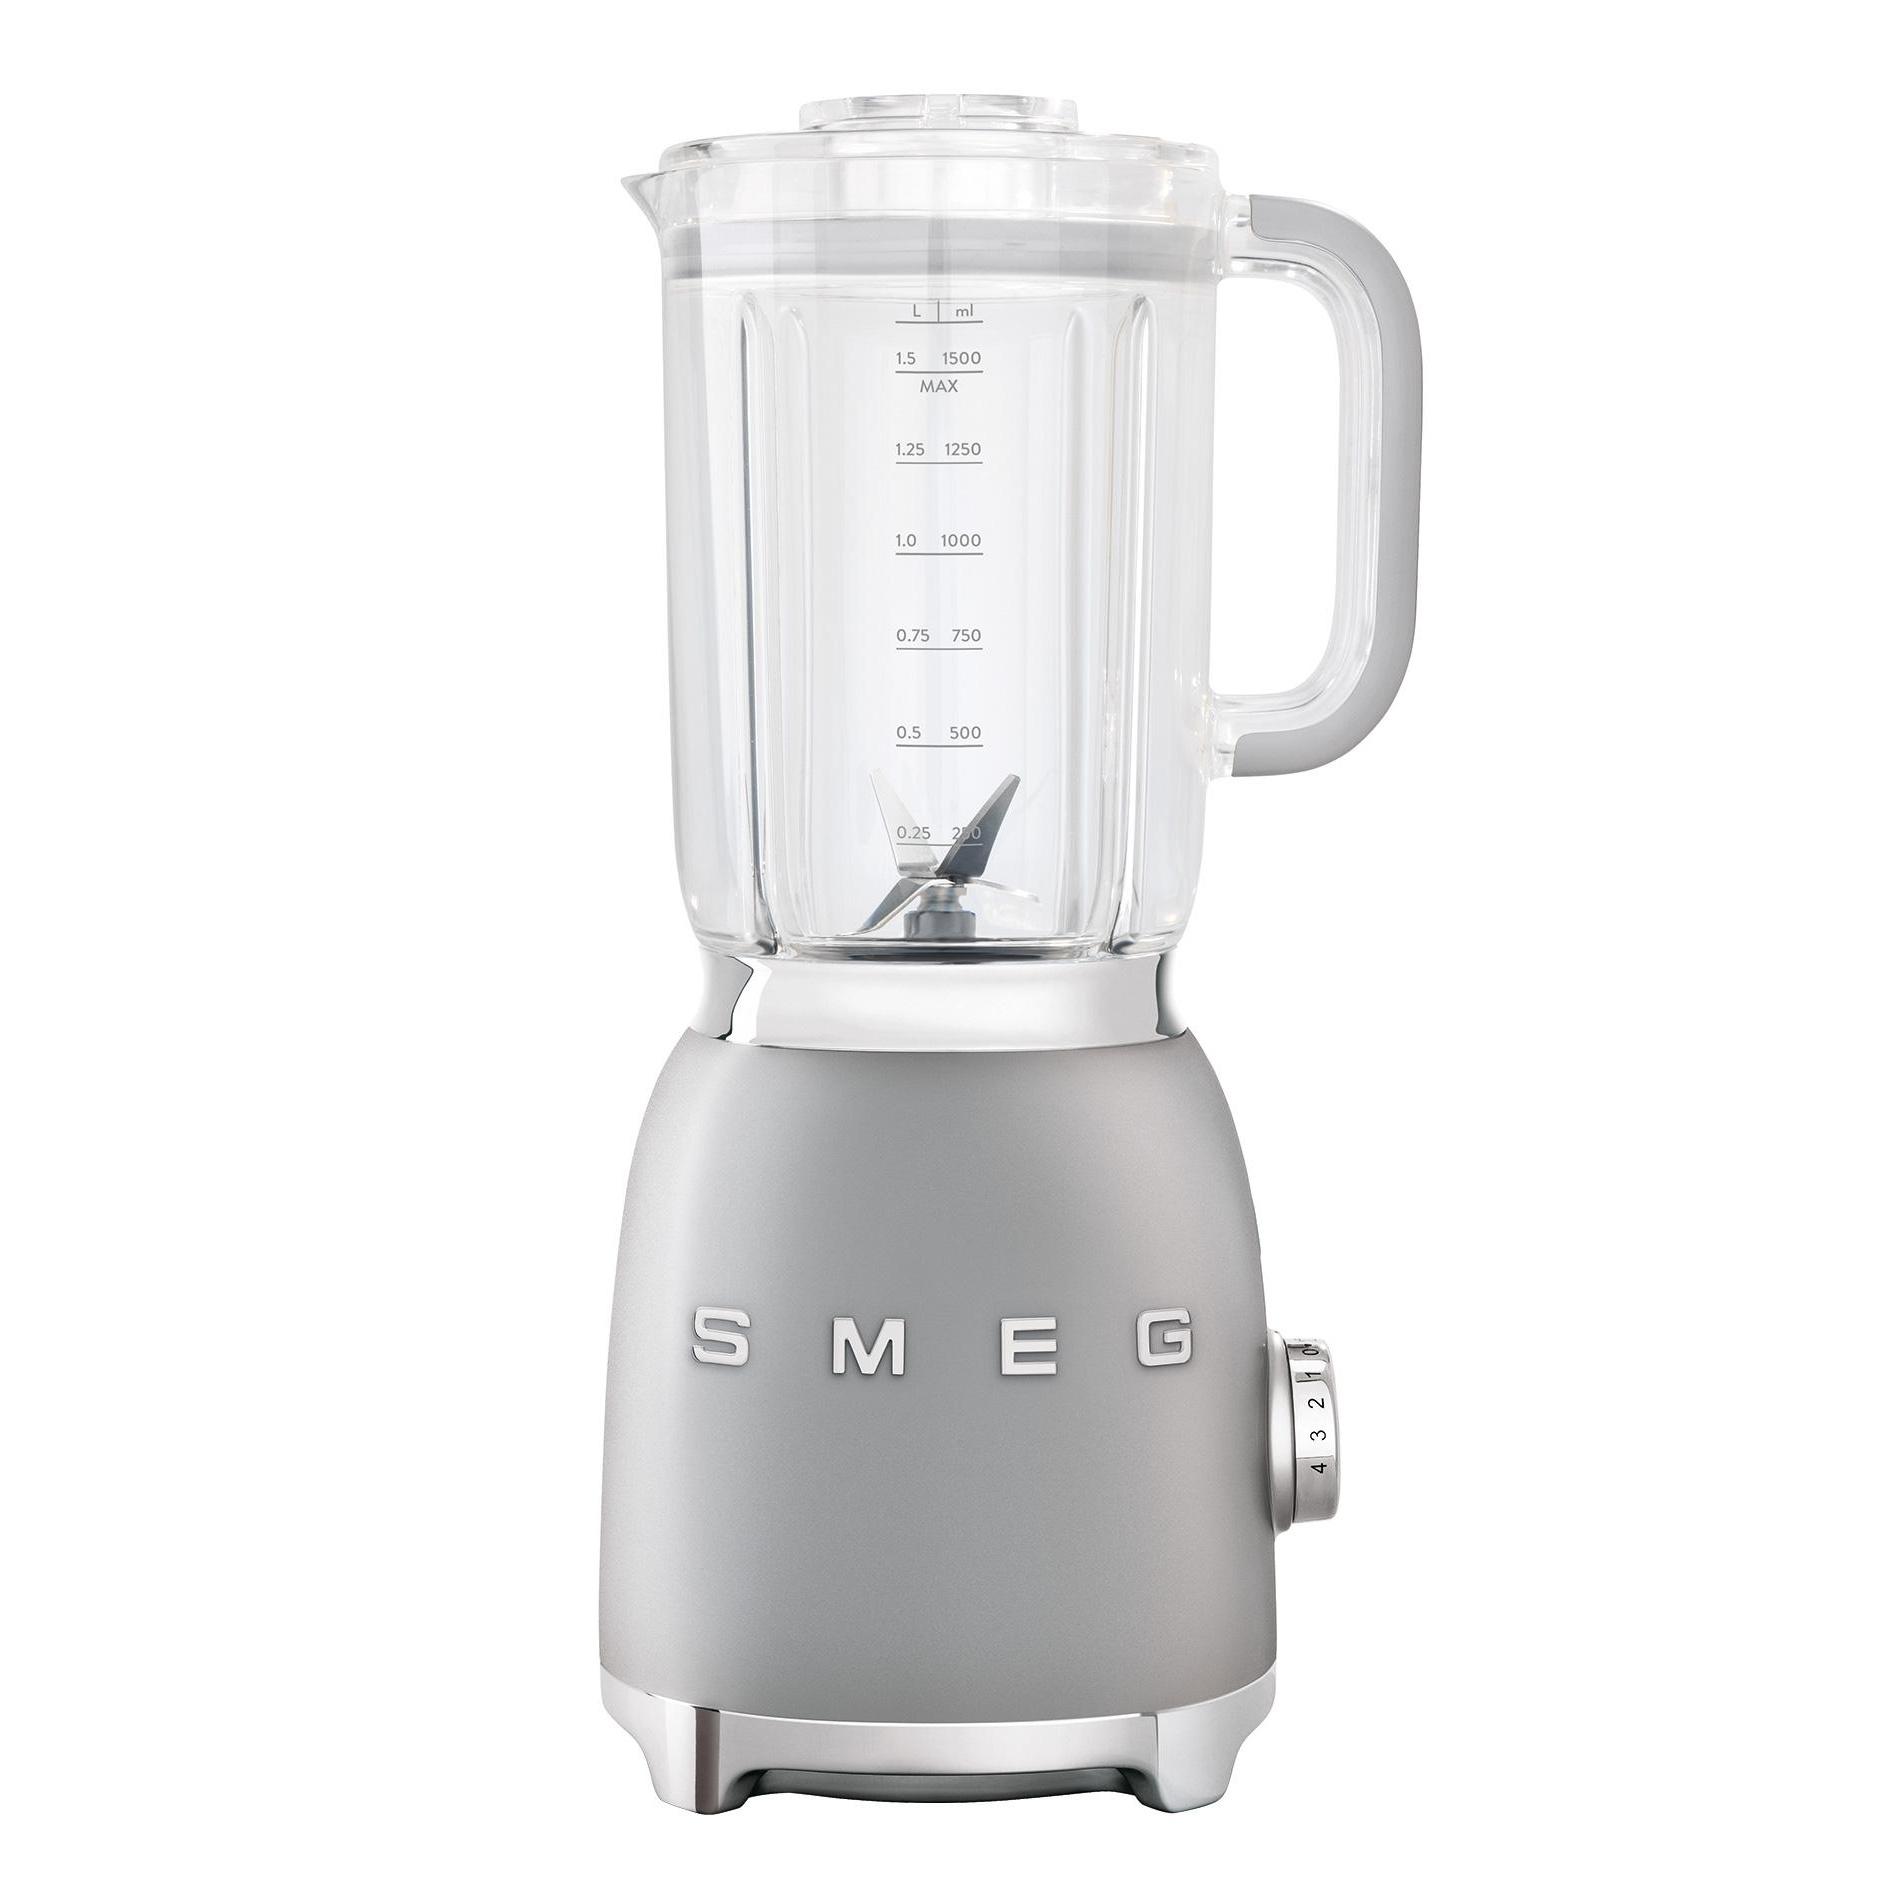 Smeg - BLF01 Standmixer 1|5L - polarsilbermetallic/lackiert/BxHxT 16|3x39|7x19|7cm | Küche und Esszimmer > Küchengeräte > Rührgeräte und Mixer | Smeg